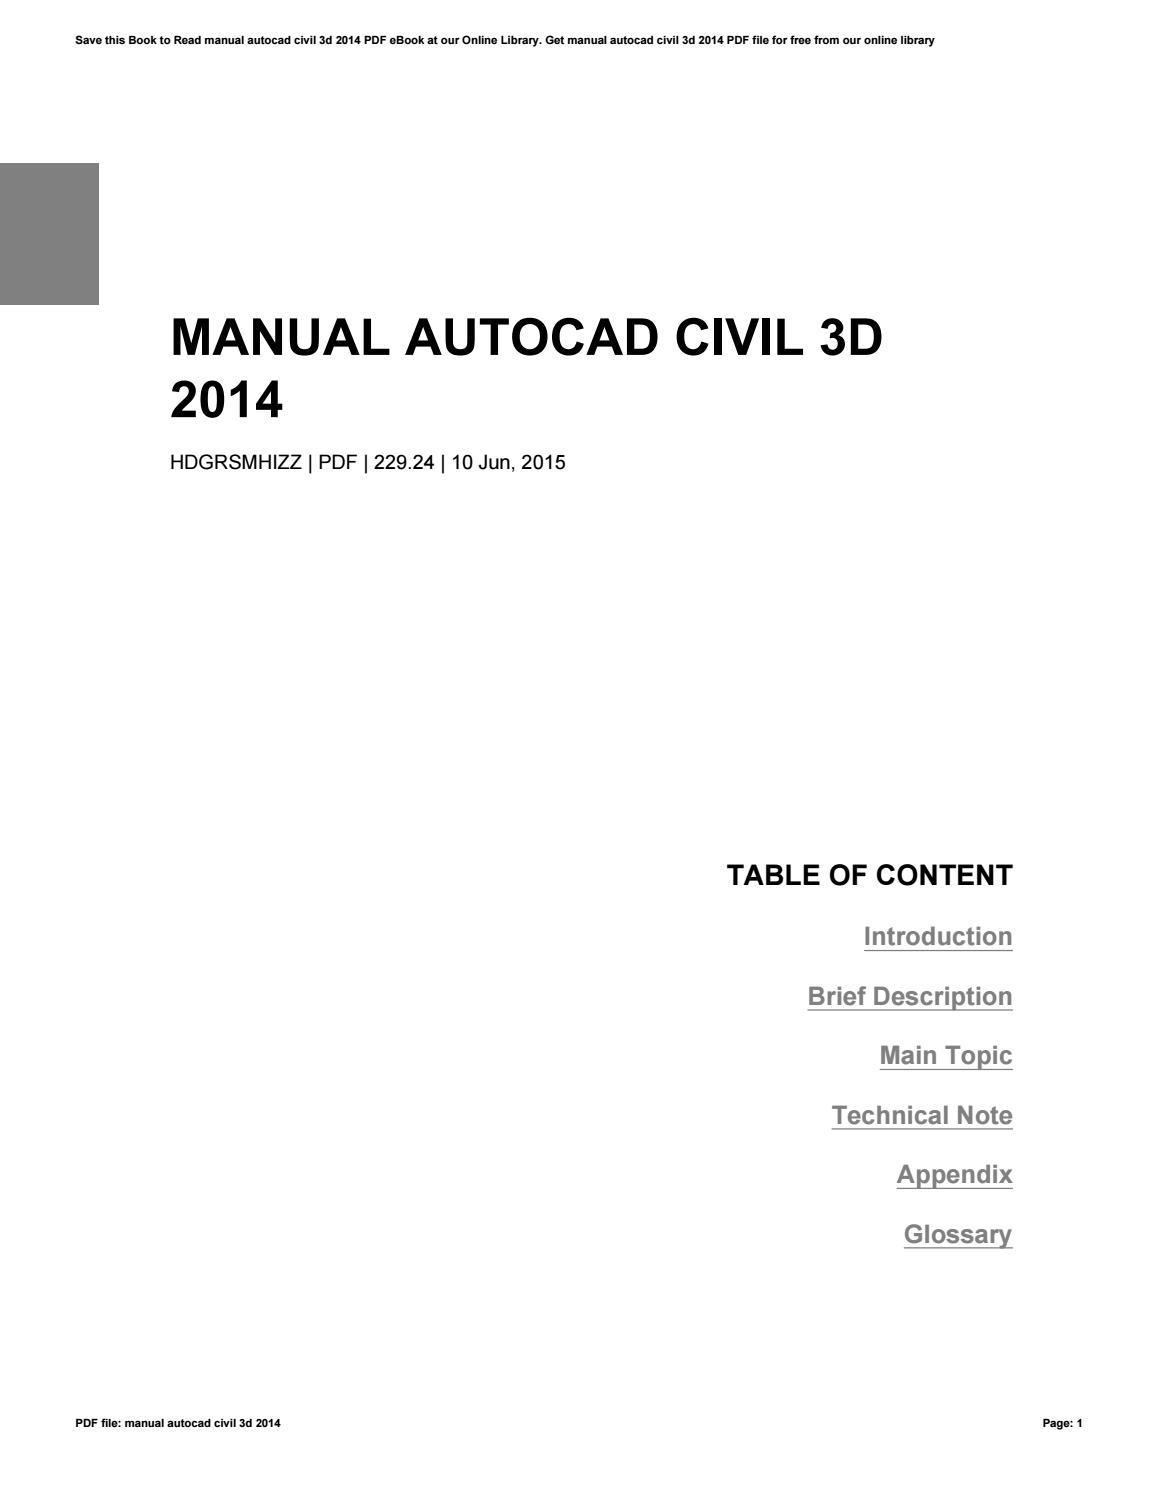 Autocad Civil 3d 2016 Tutorial Pdf Free Download